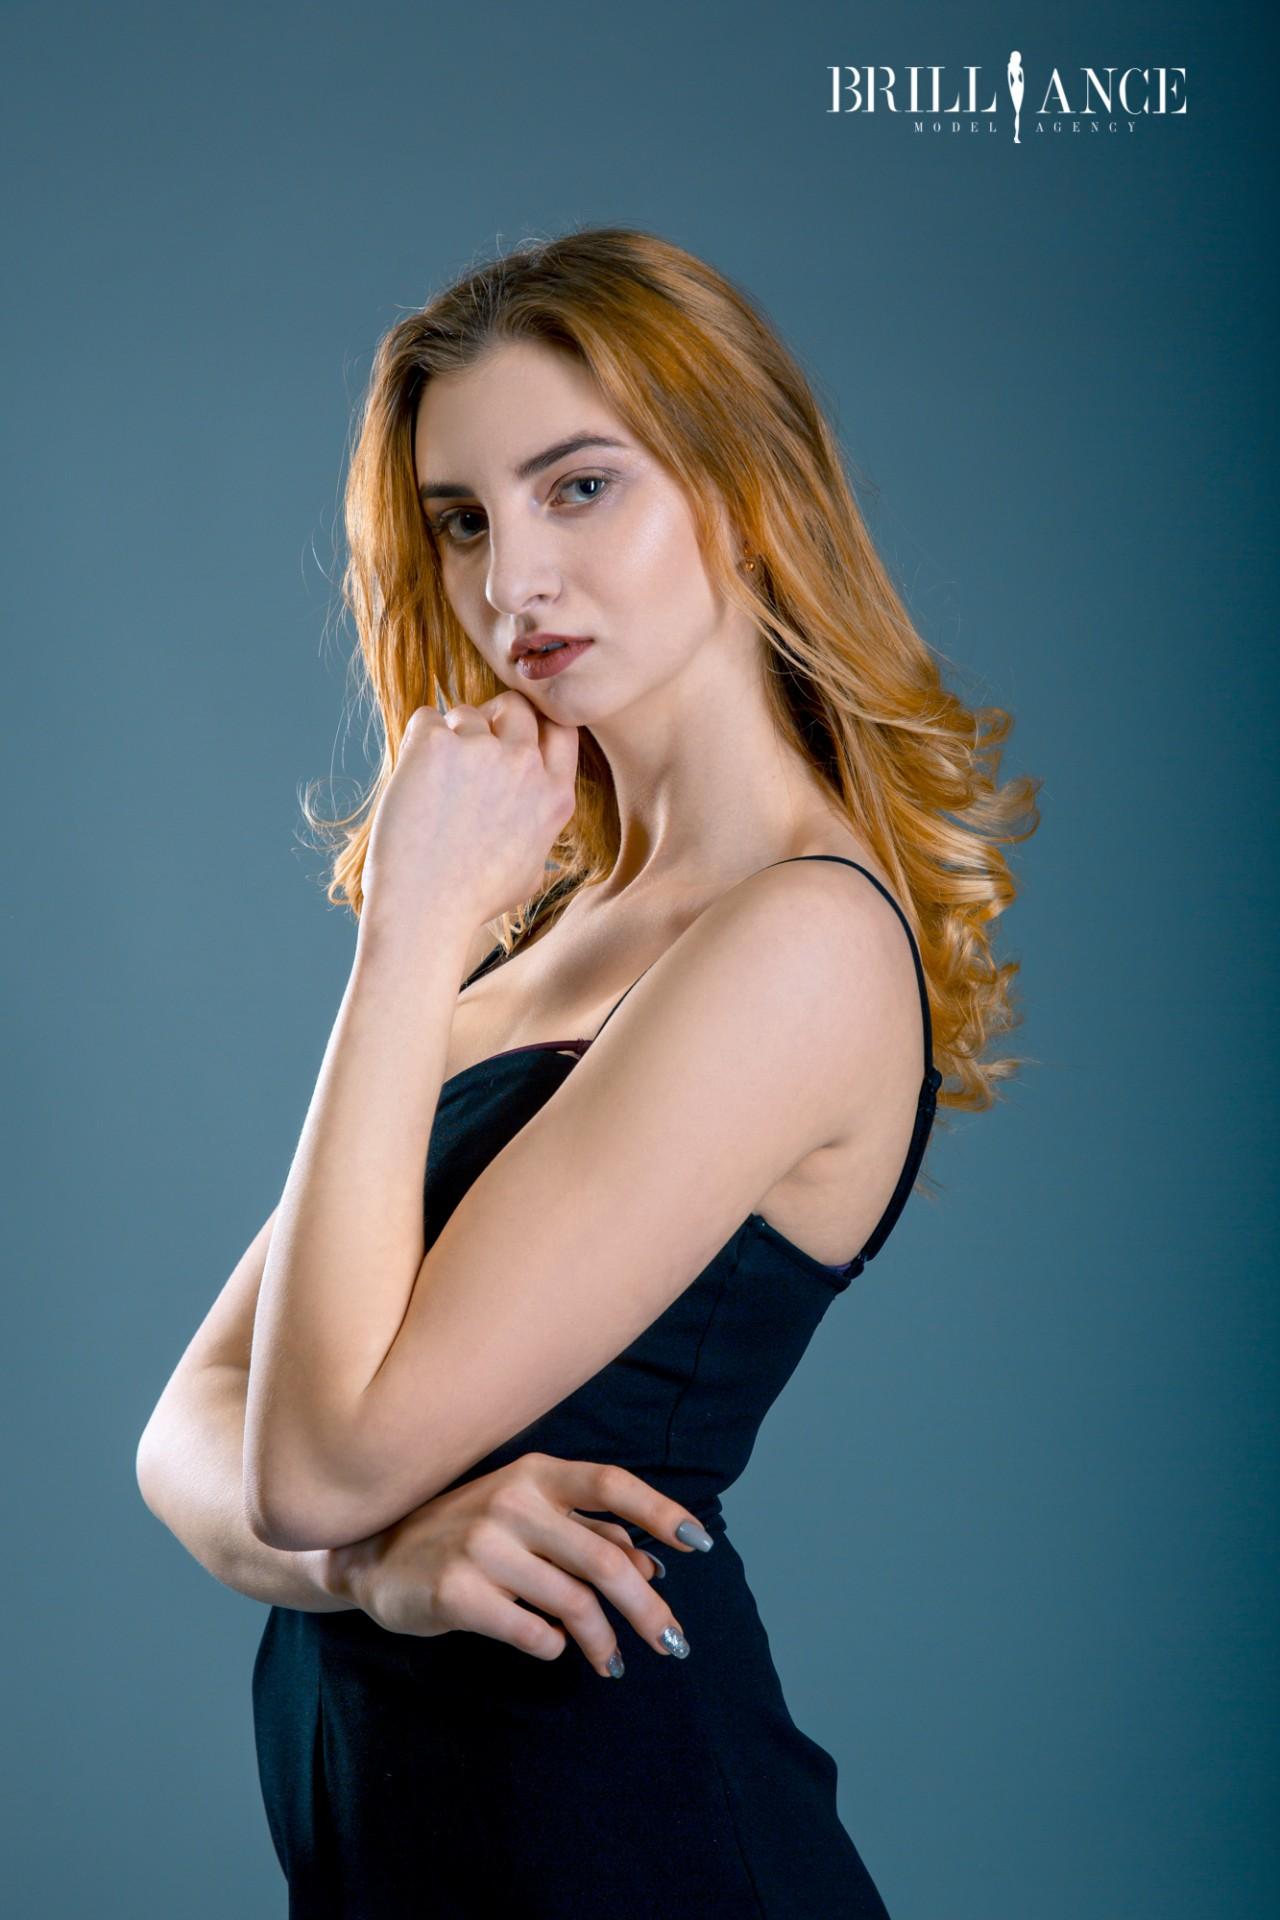 Anastasia 177 cm, 58 kg, 21 years | Brilliance Model Agency